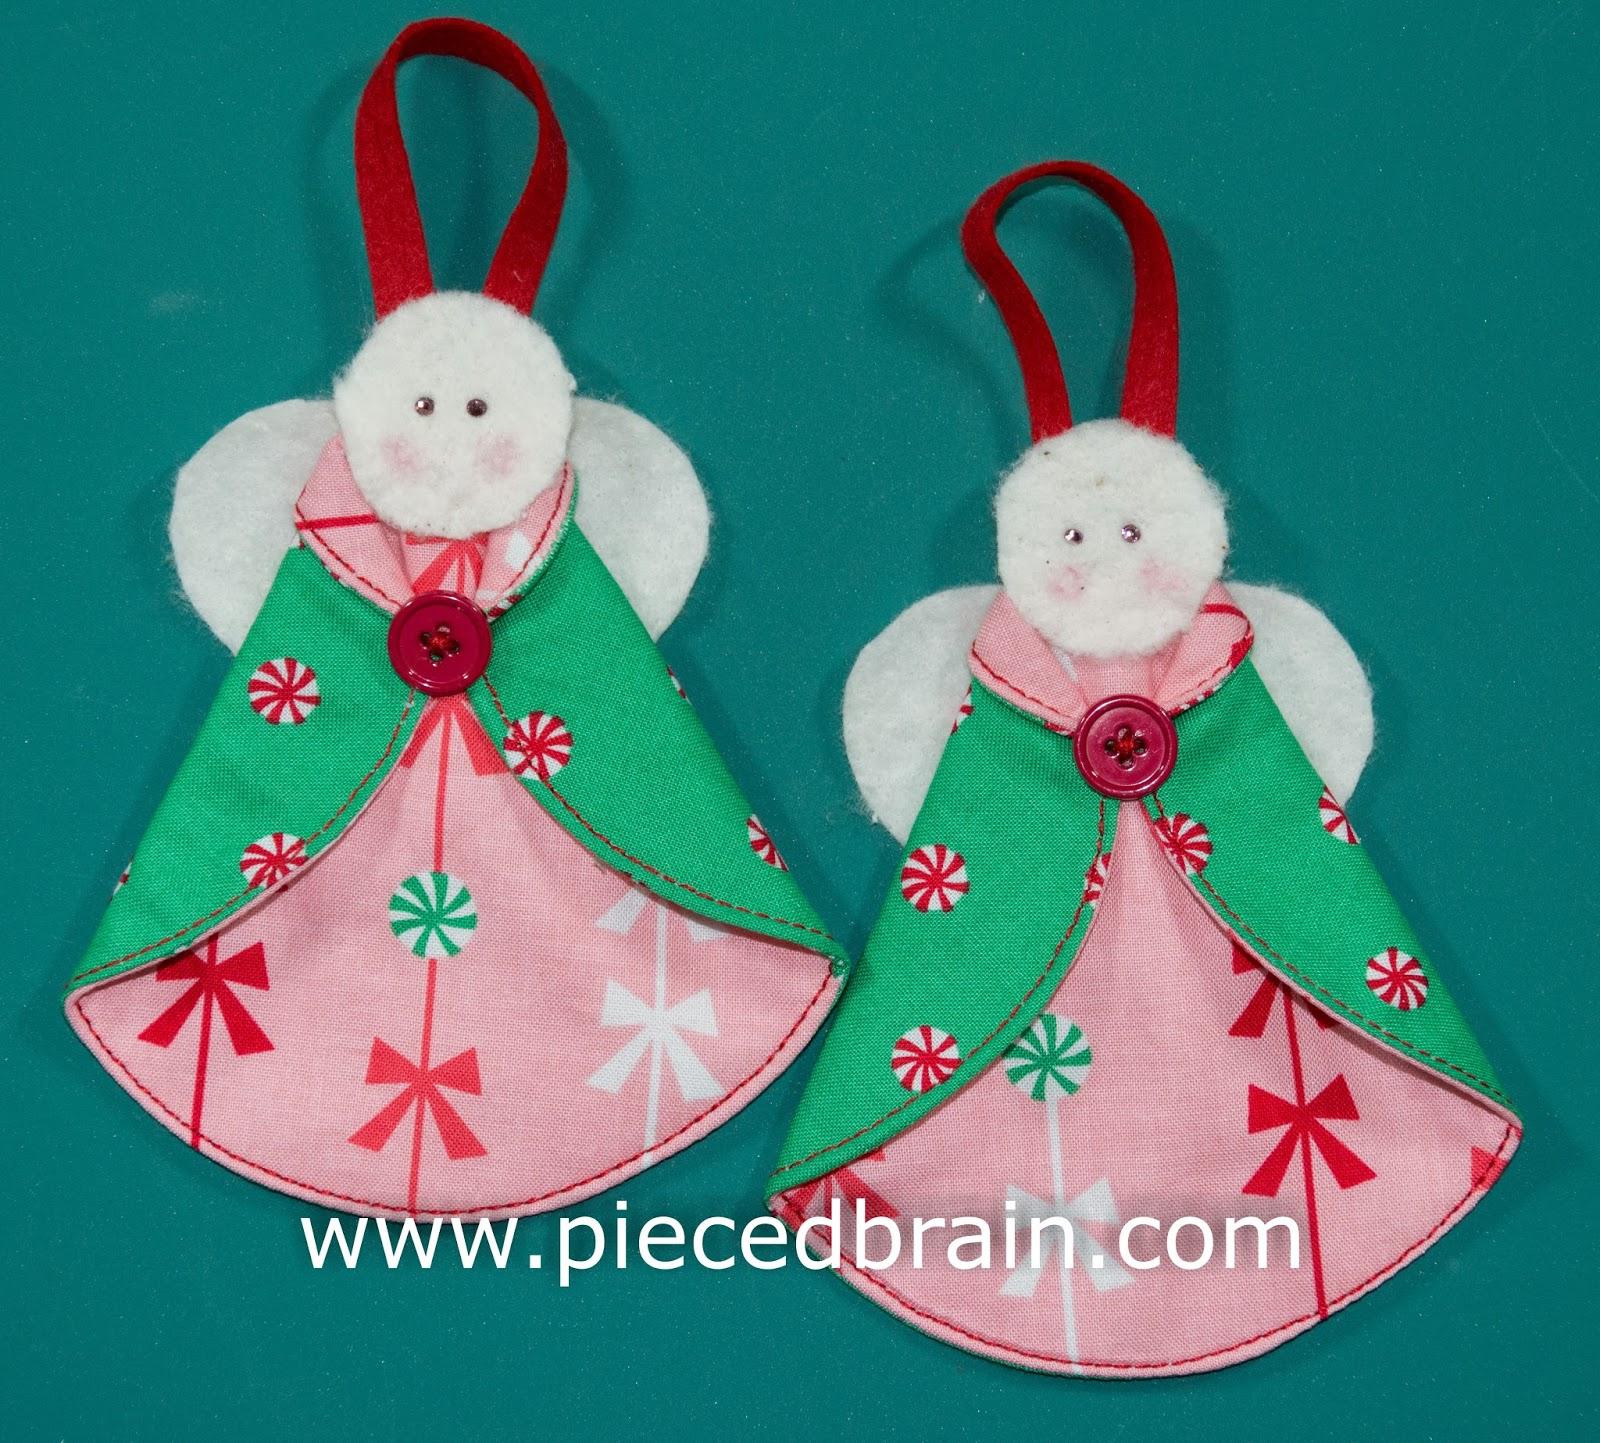 Pieced Brain: Christmas Angels